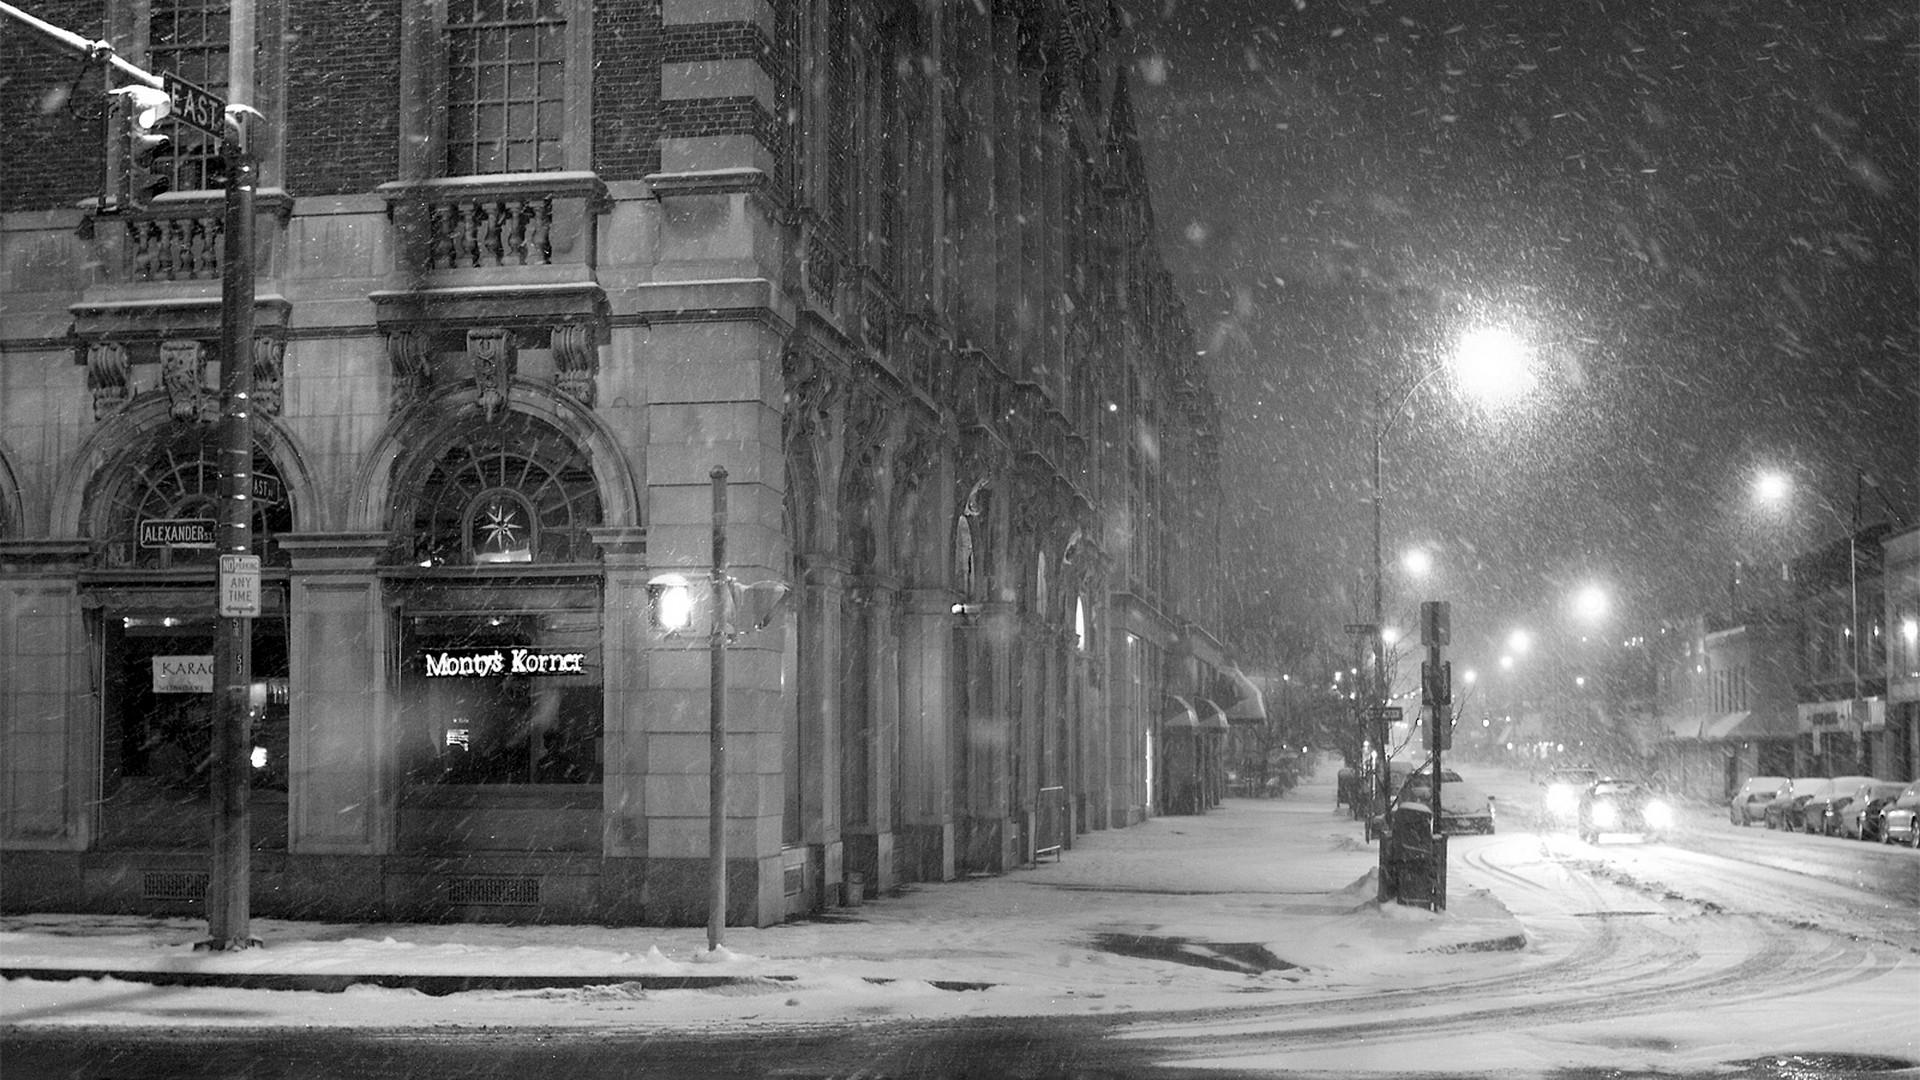 Street Light Monochrome City Night Snow Winter Road Infrastructure Weather Darkness Lane Urban Area Black